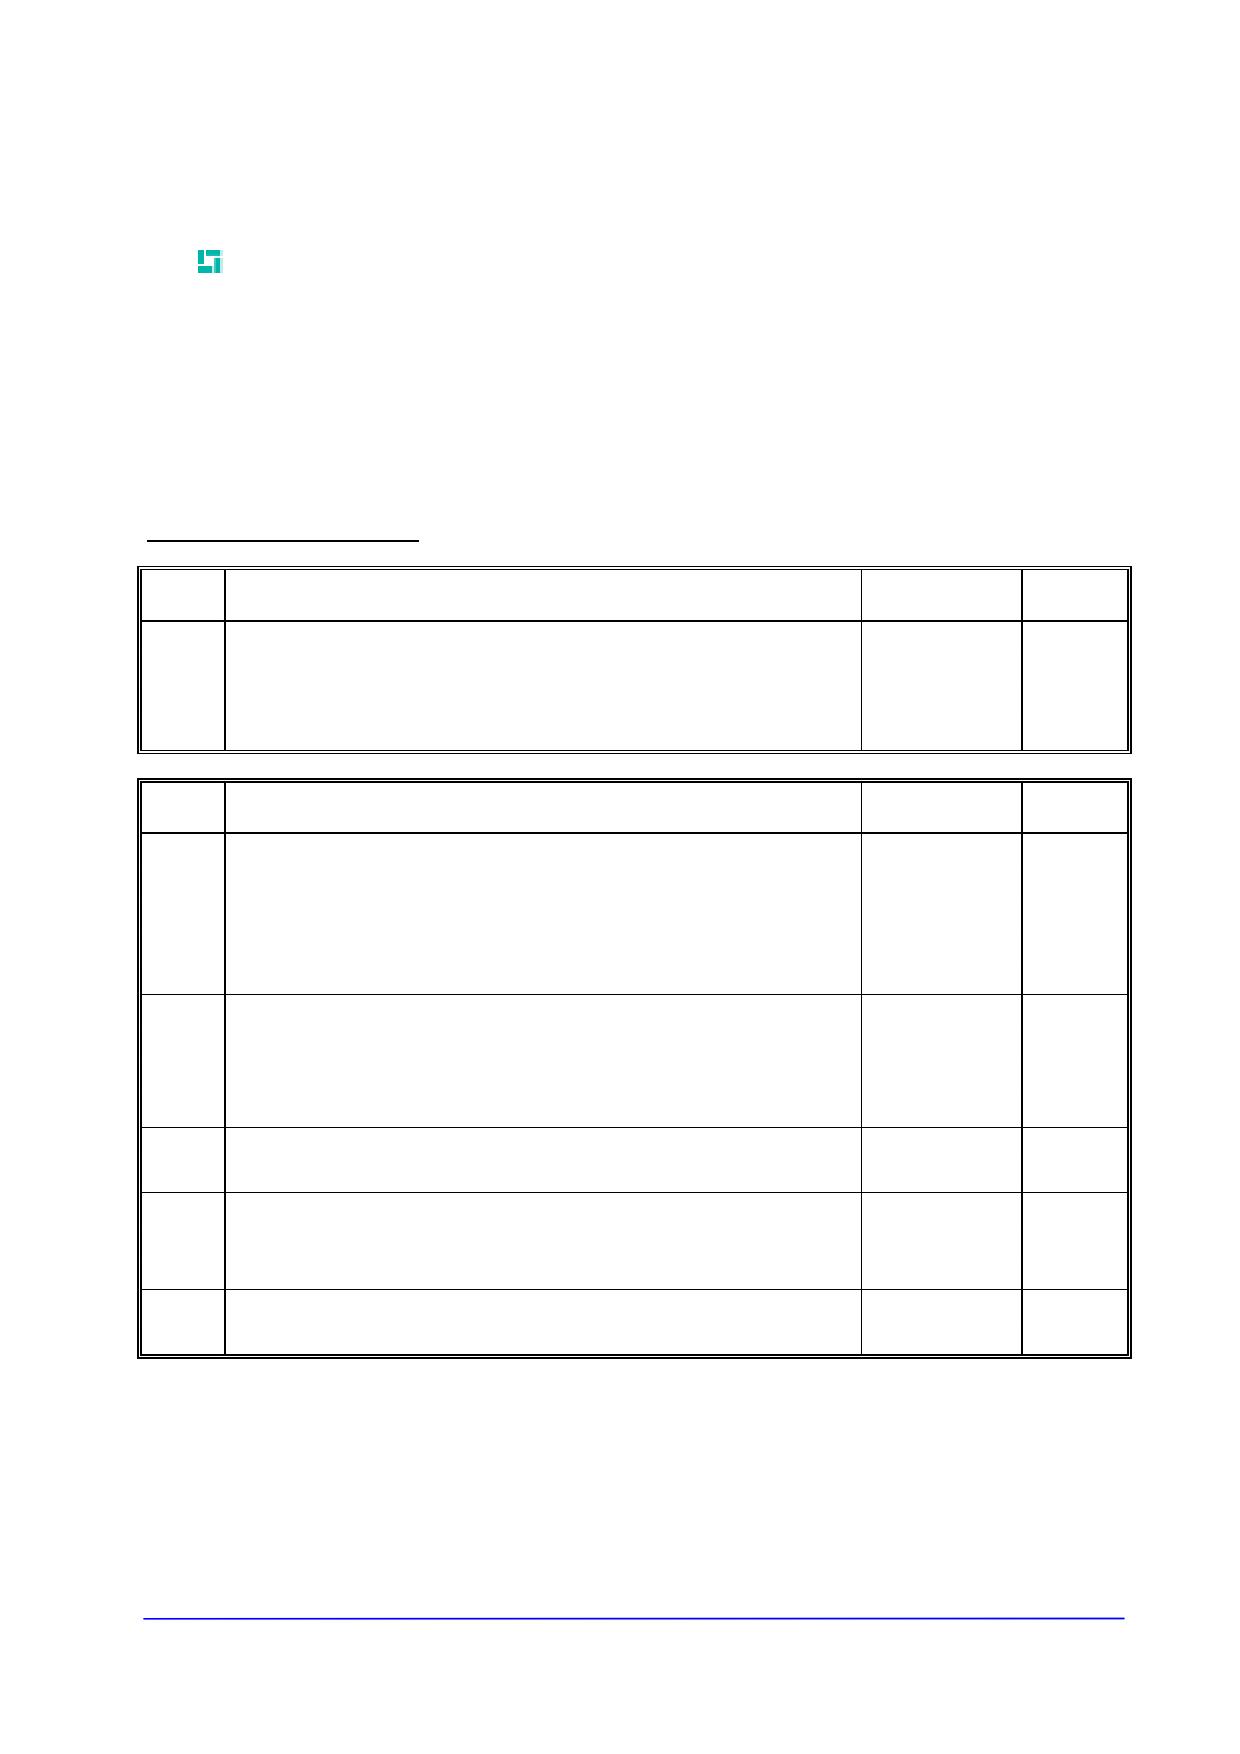 R0487YS10E datasheet